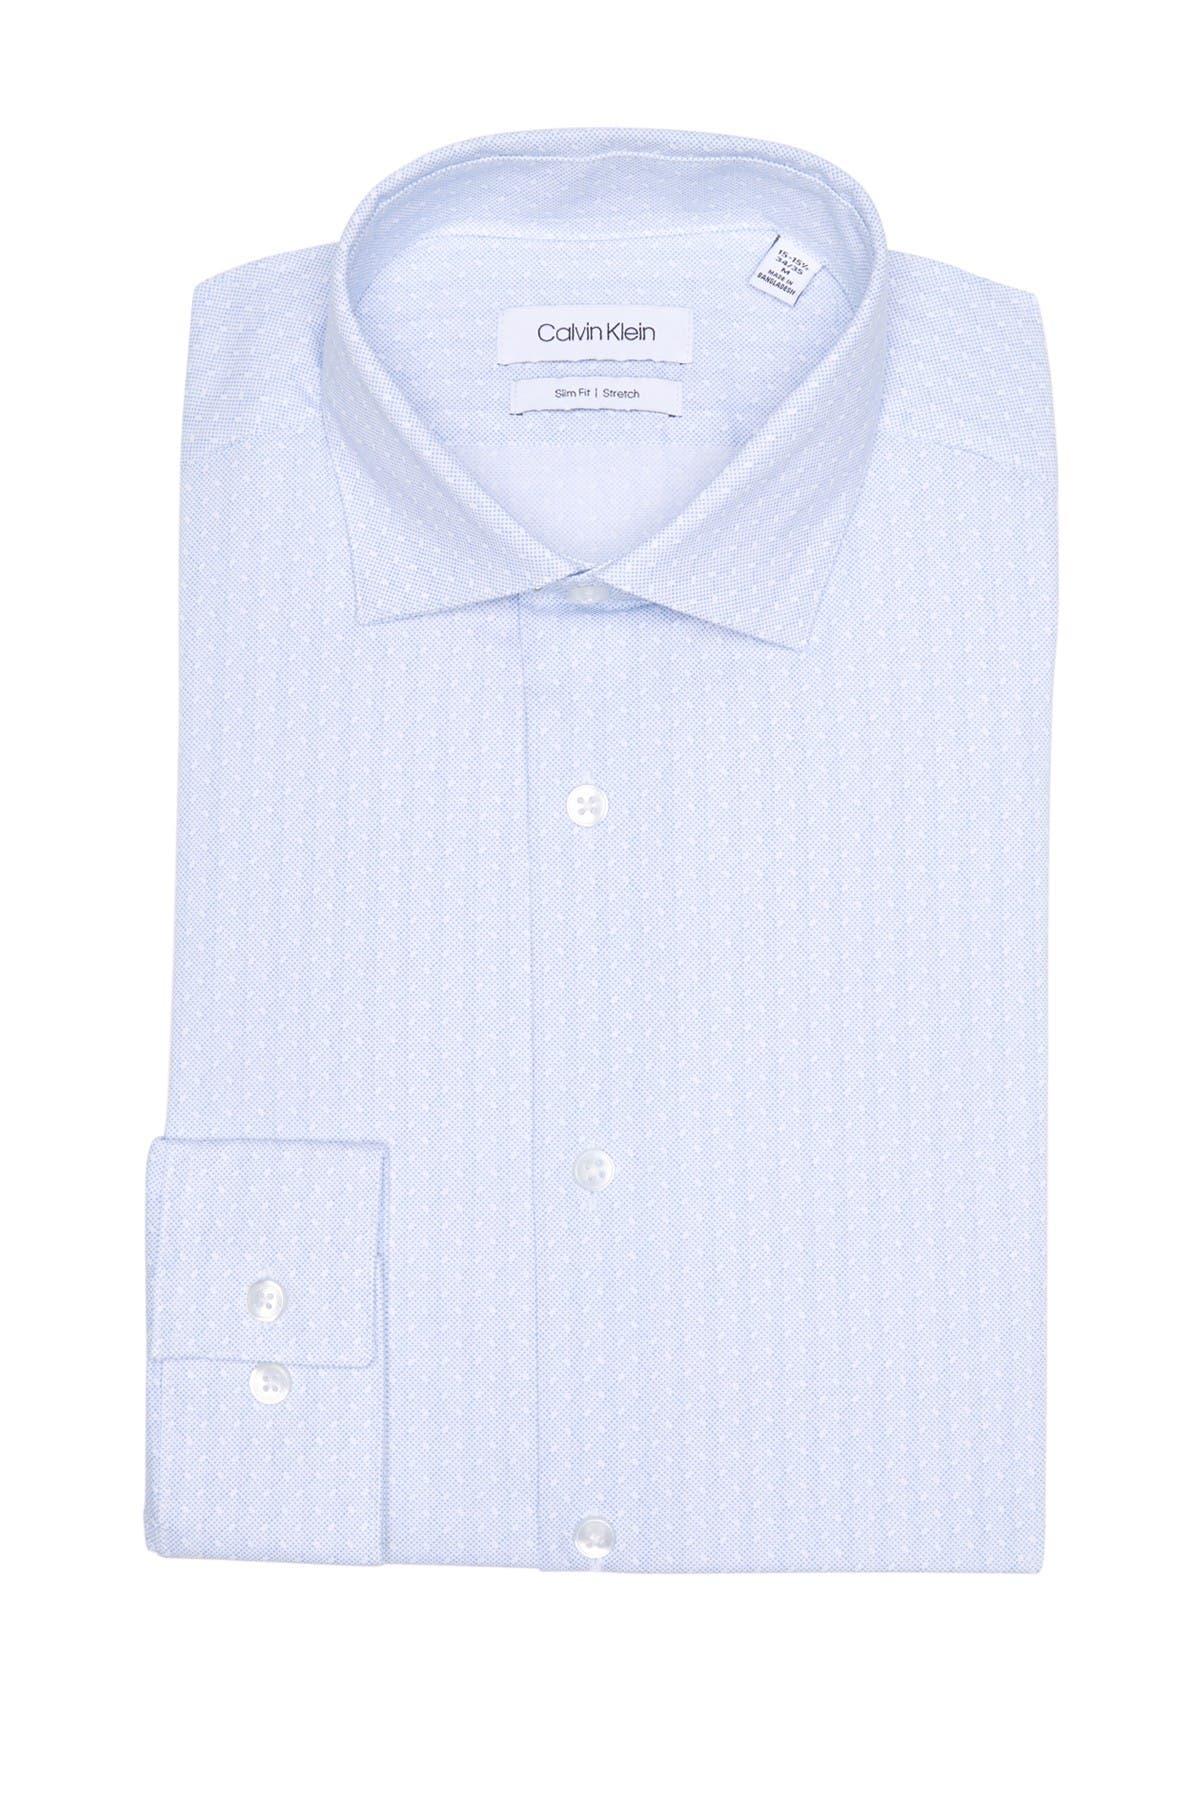 Image of Calvin Klein Pure Finish Slim Fit Dress Shirt